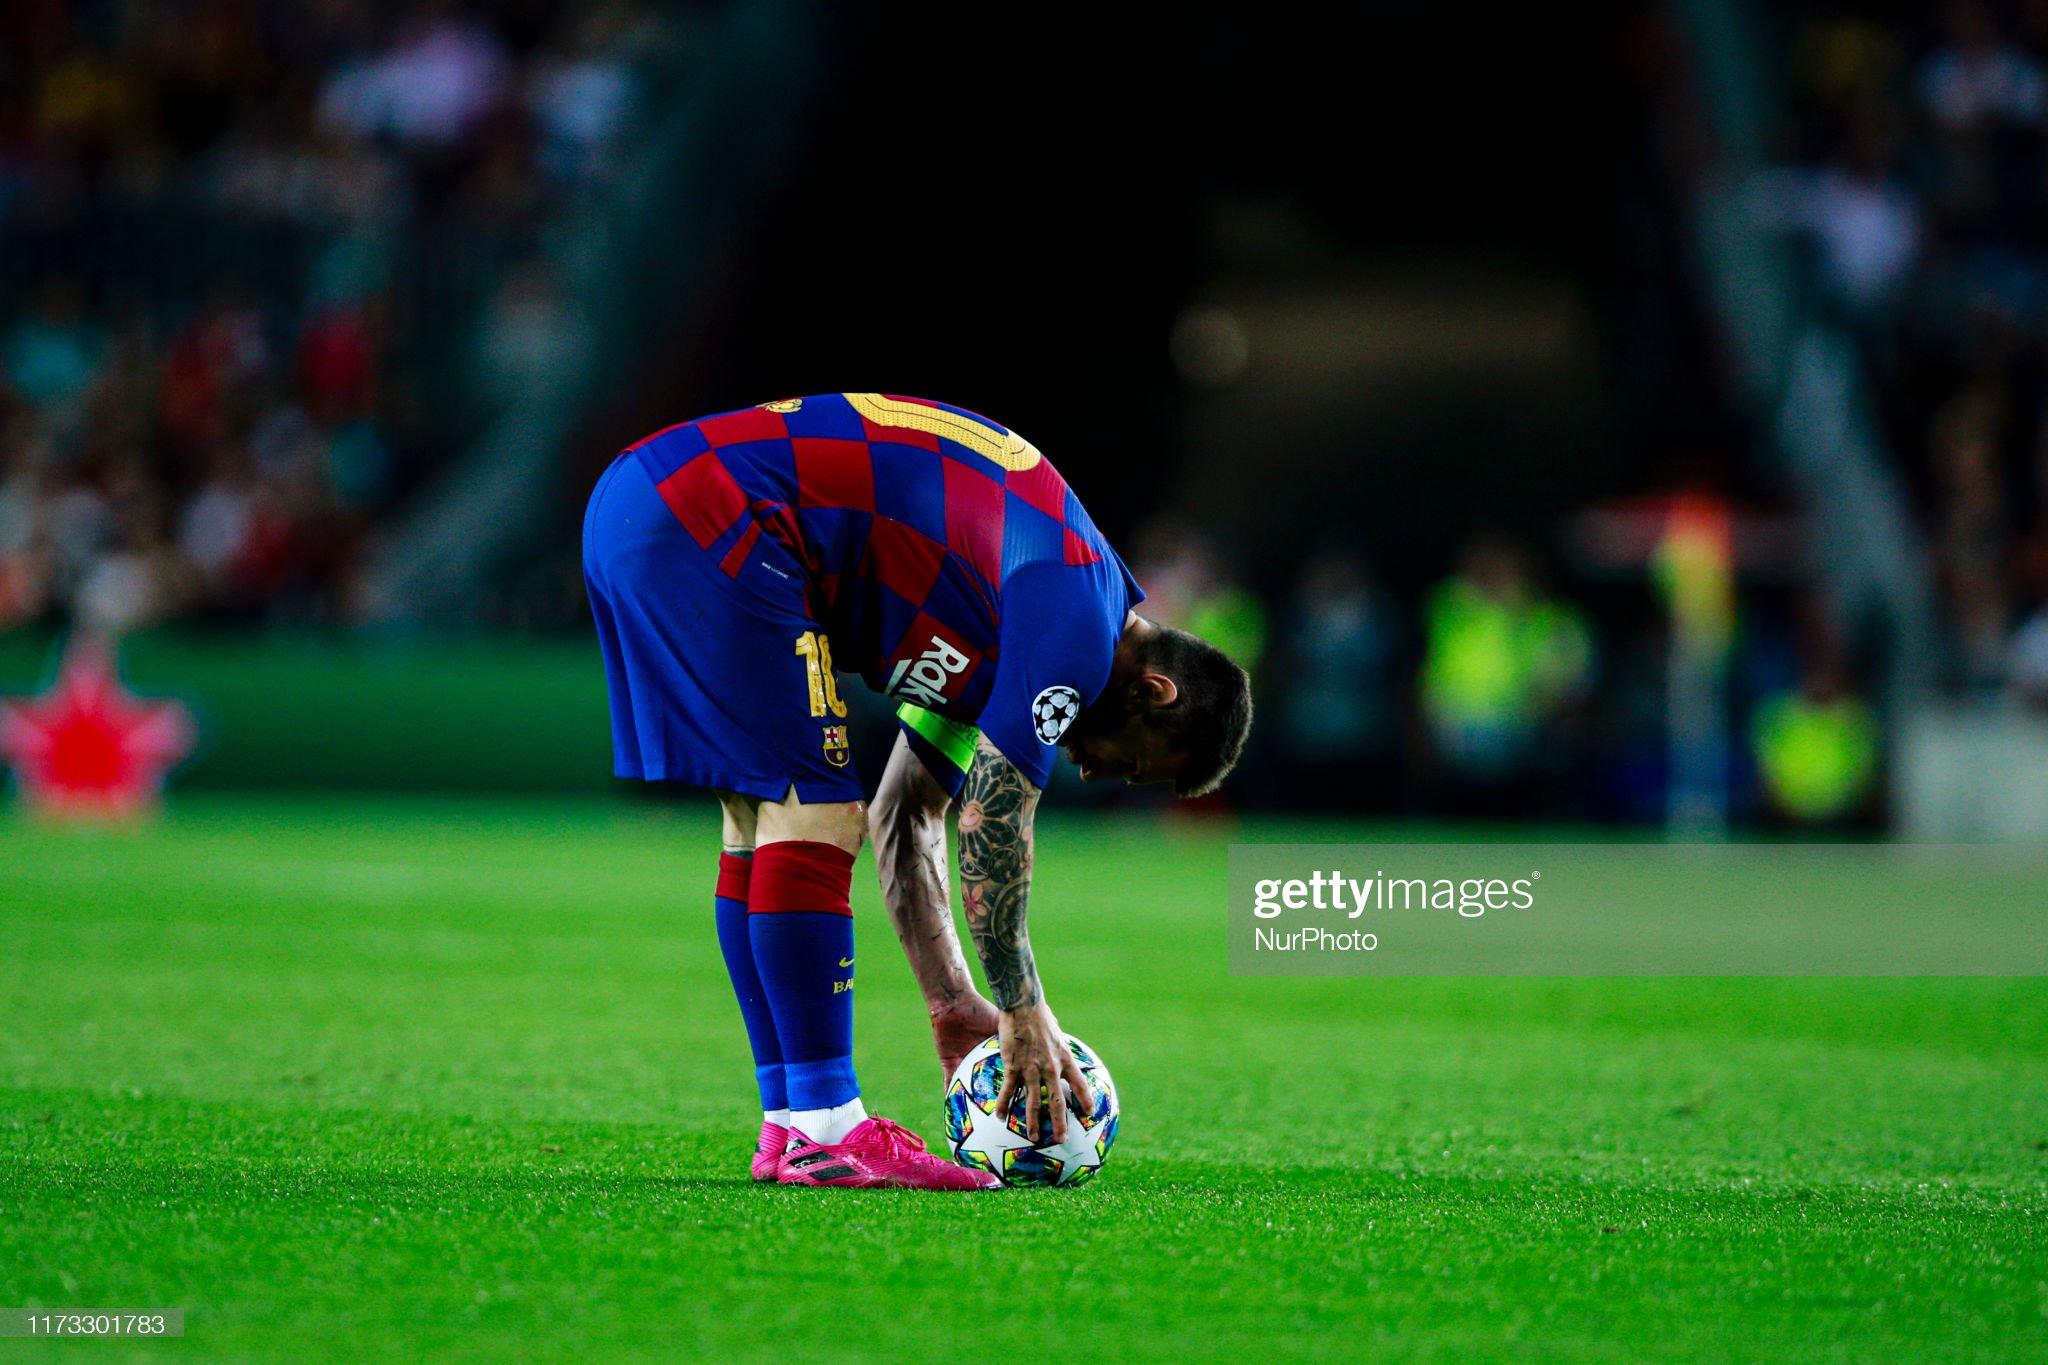 صور مباراة : برشلونة - إنتر 2-1 ( 02-10-2019 )  Lionel-messi-from-argentina-of-fc-barcelona-during-the-uefa-champions-picture-id1173301783?s=2048x2048